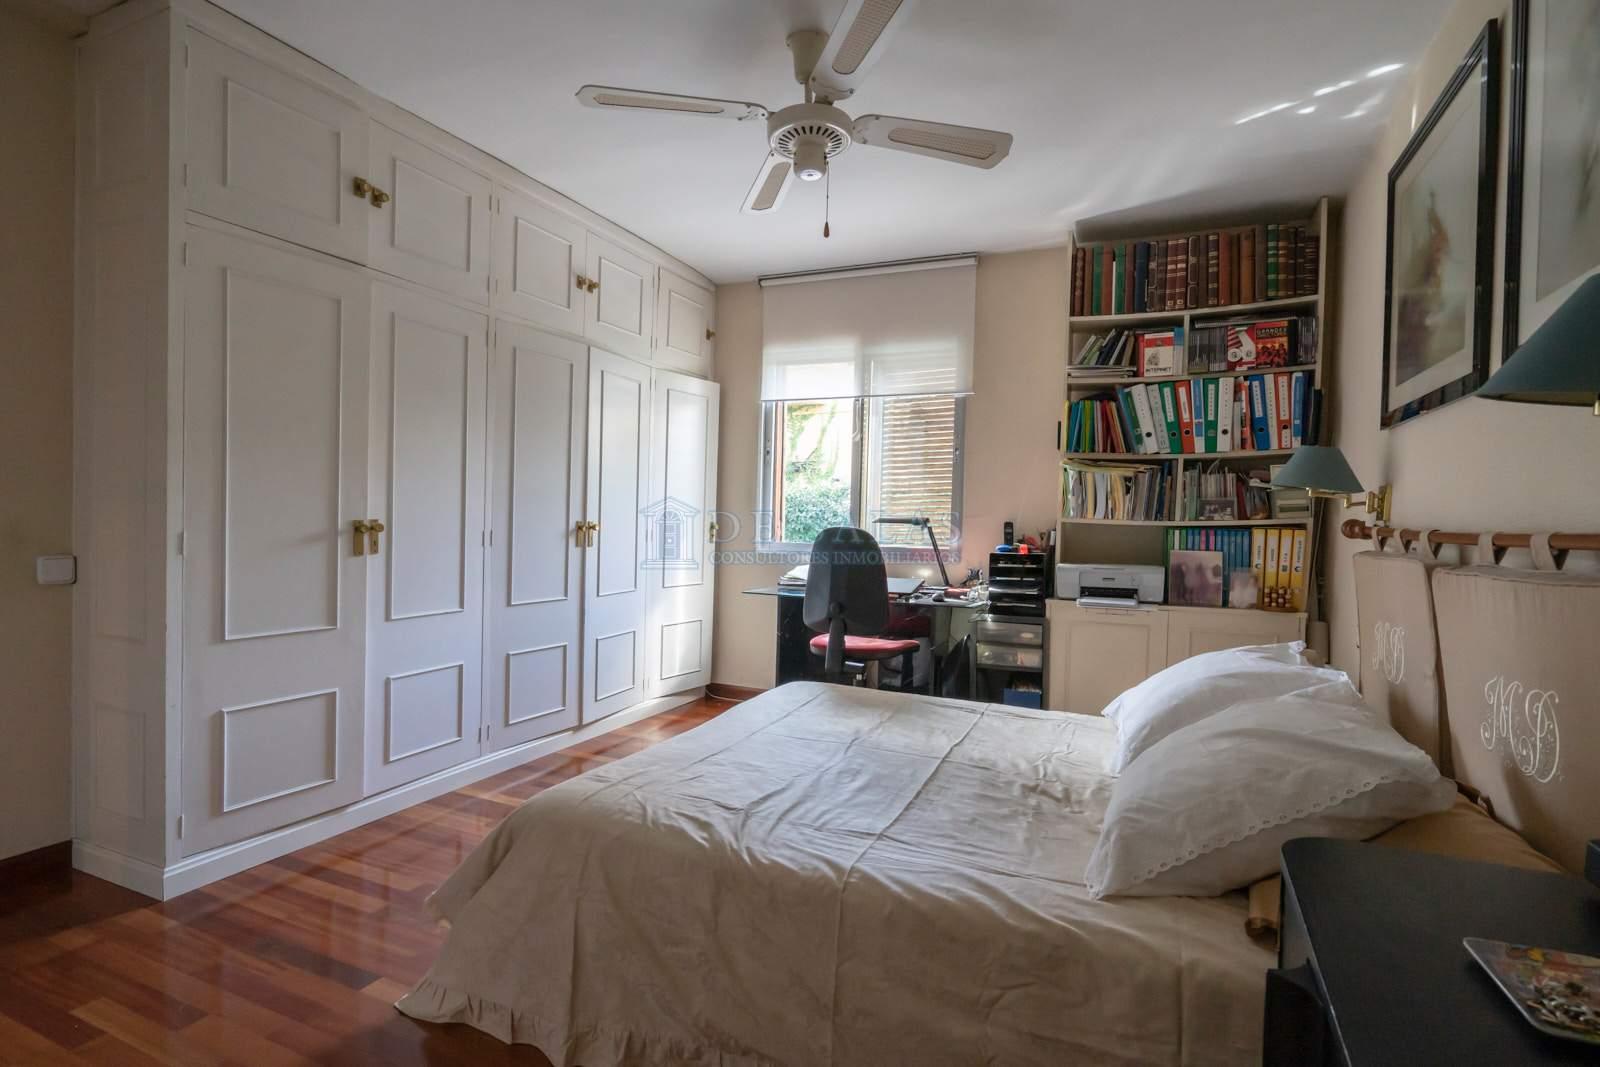 07-Dormitorio Piso Soto de la Moraleja